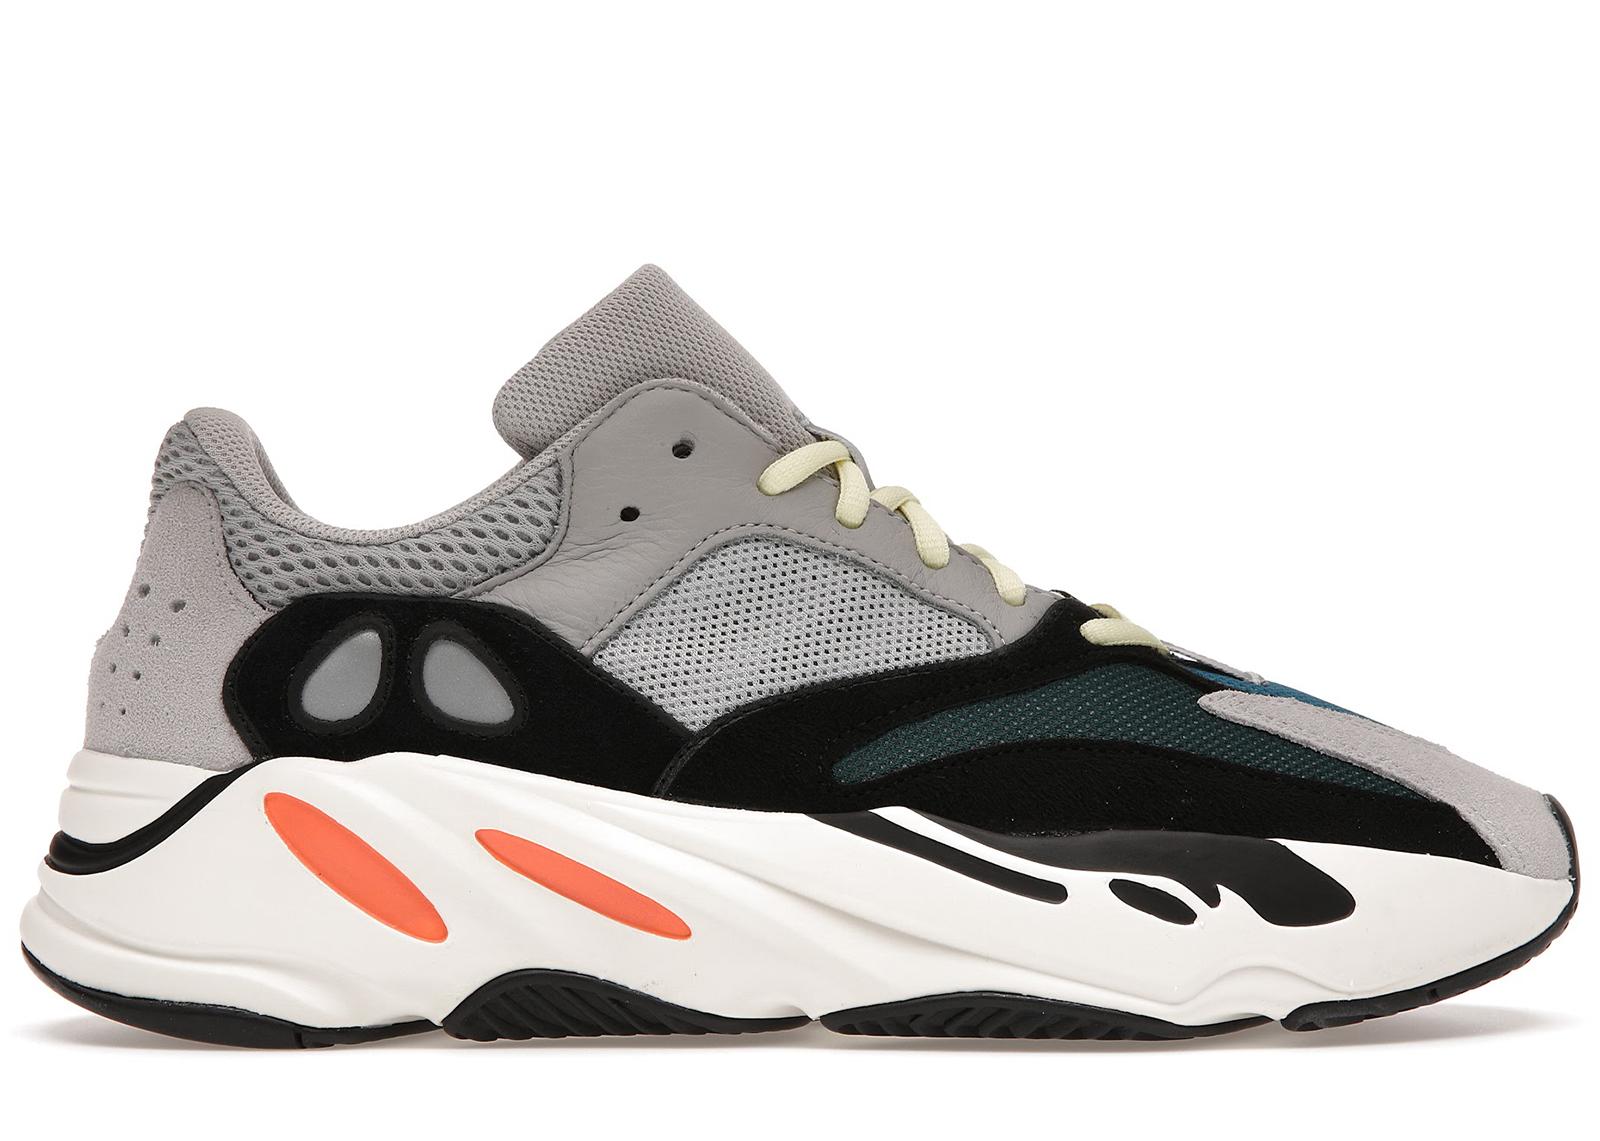 Acheter adidas Yeezy Chaussures et sneakers neuves